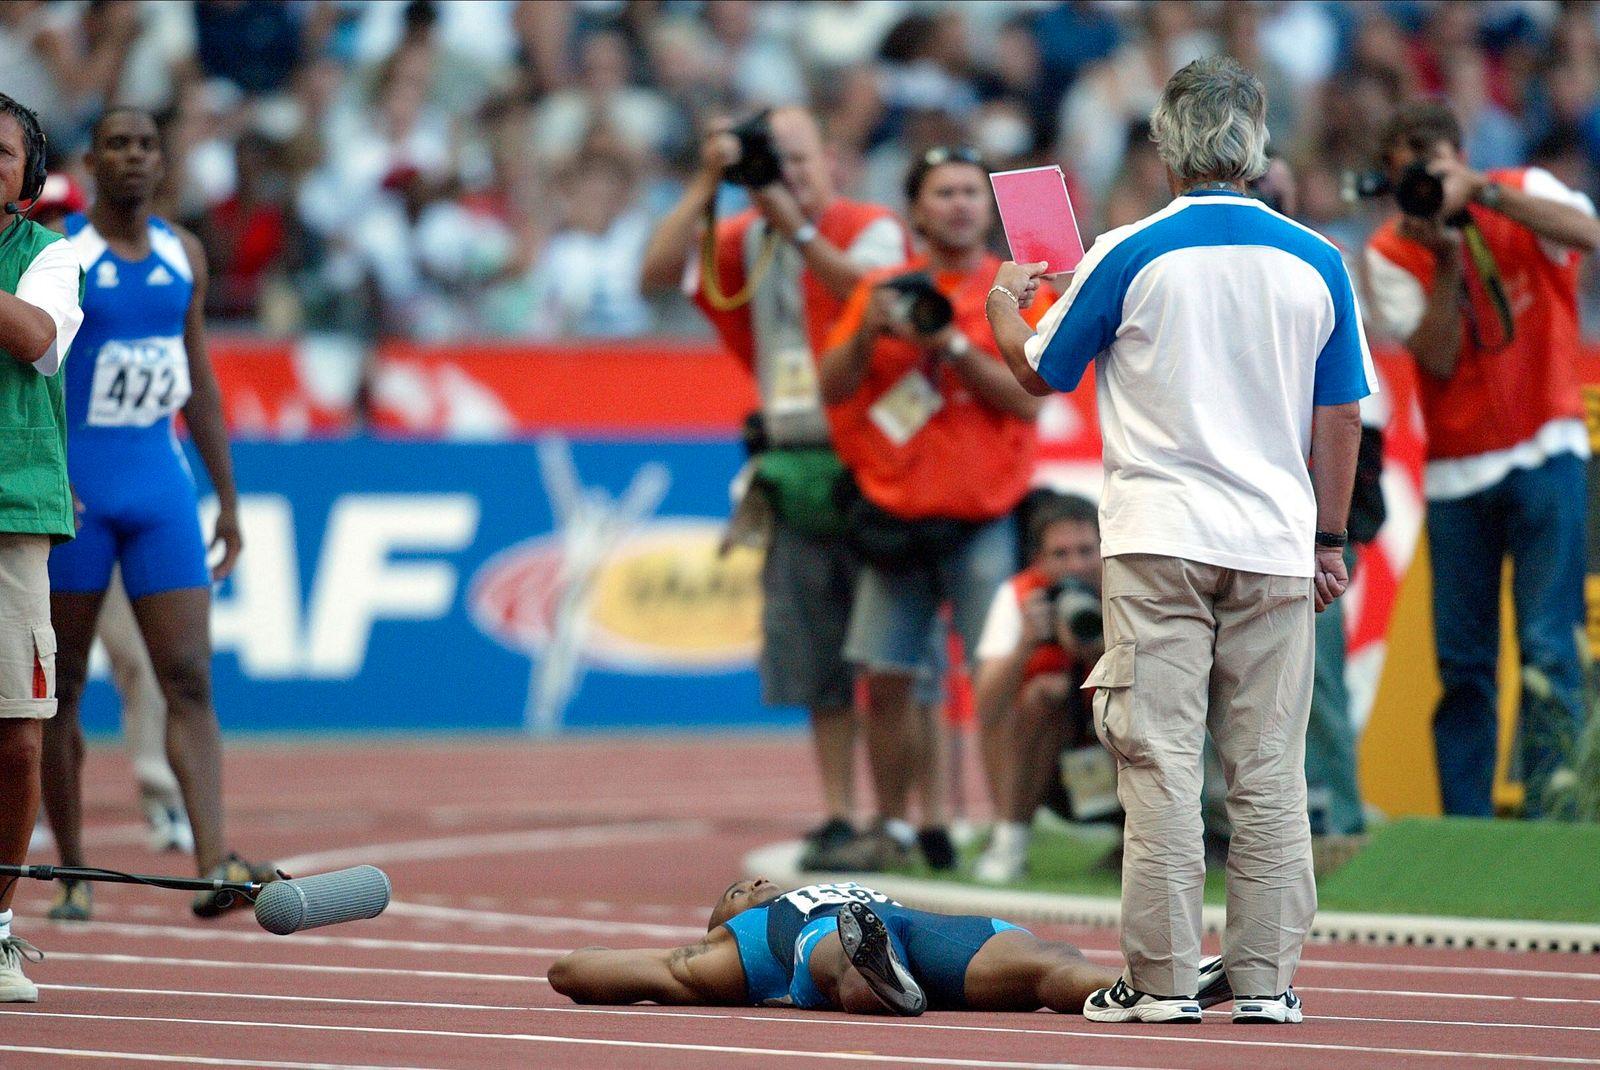 Jon Drummond 100 Metres Protest World Athletics Championships Stade De Frnace, St Denis, Paris, France 24 August 2003 PU